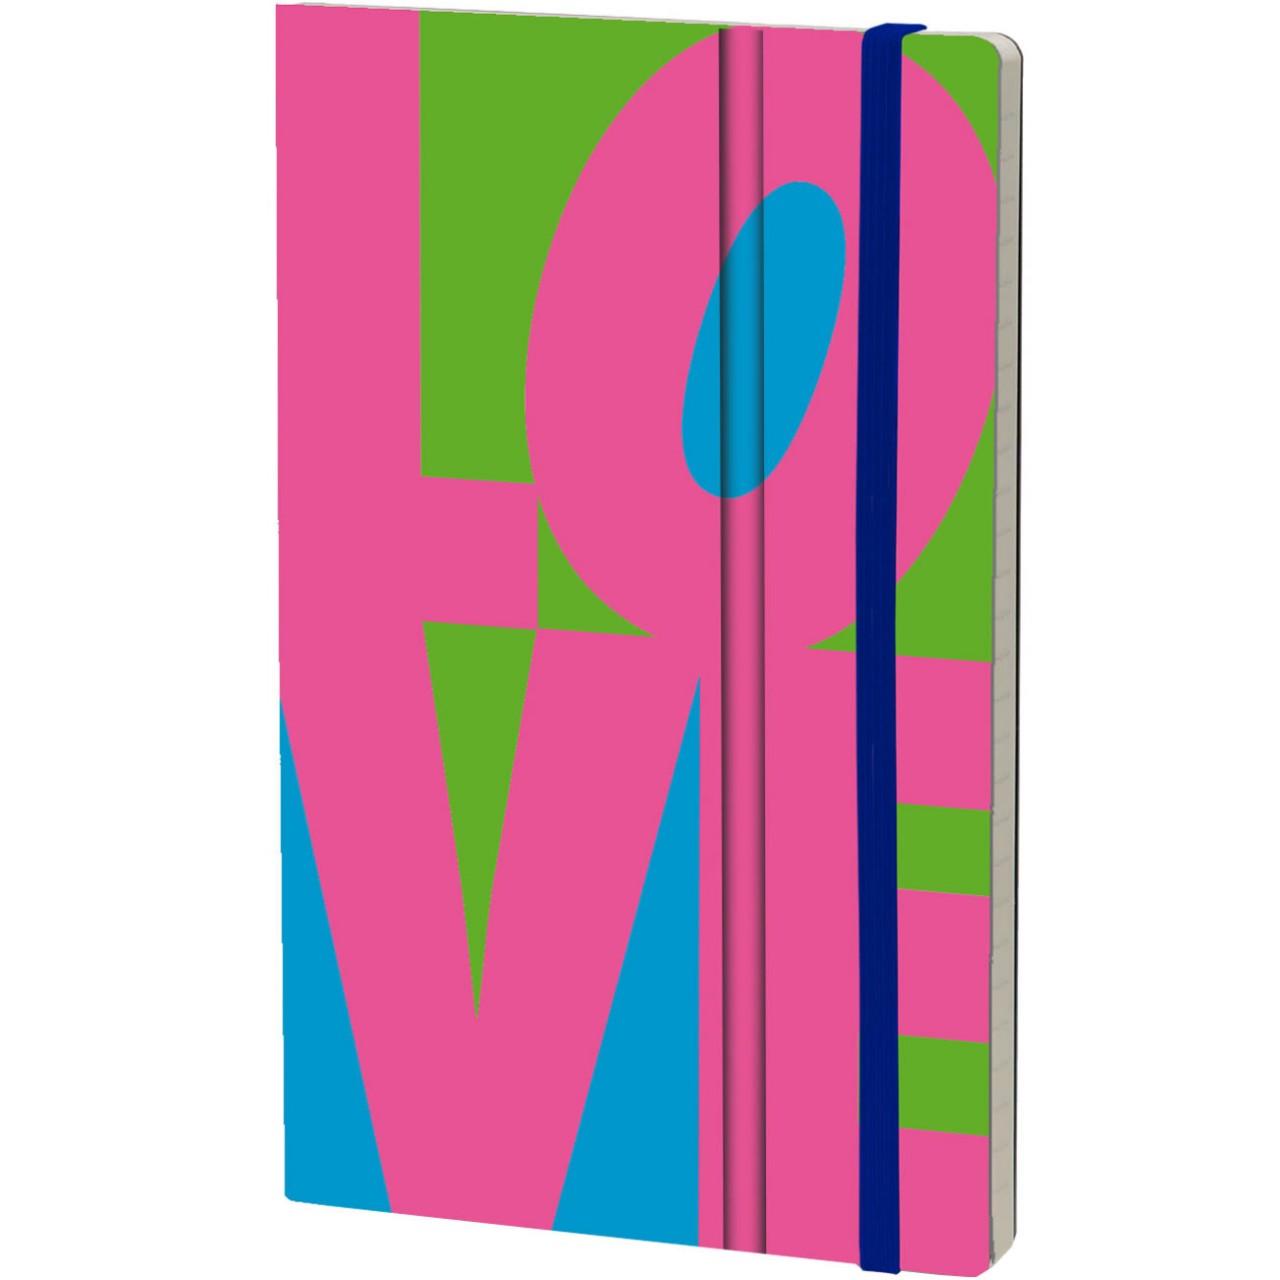 Stifflexible Notizbuch FLUO LOVE 13 x 21 cm 192 S., FUCHSIA